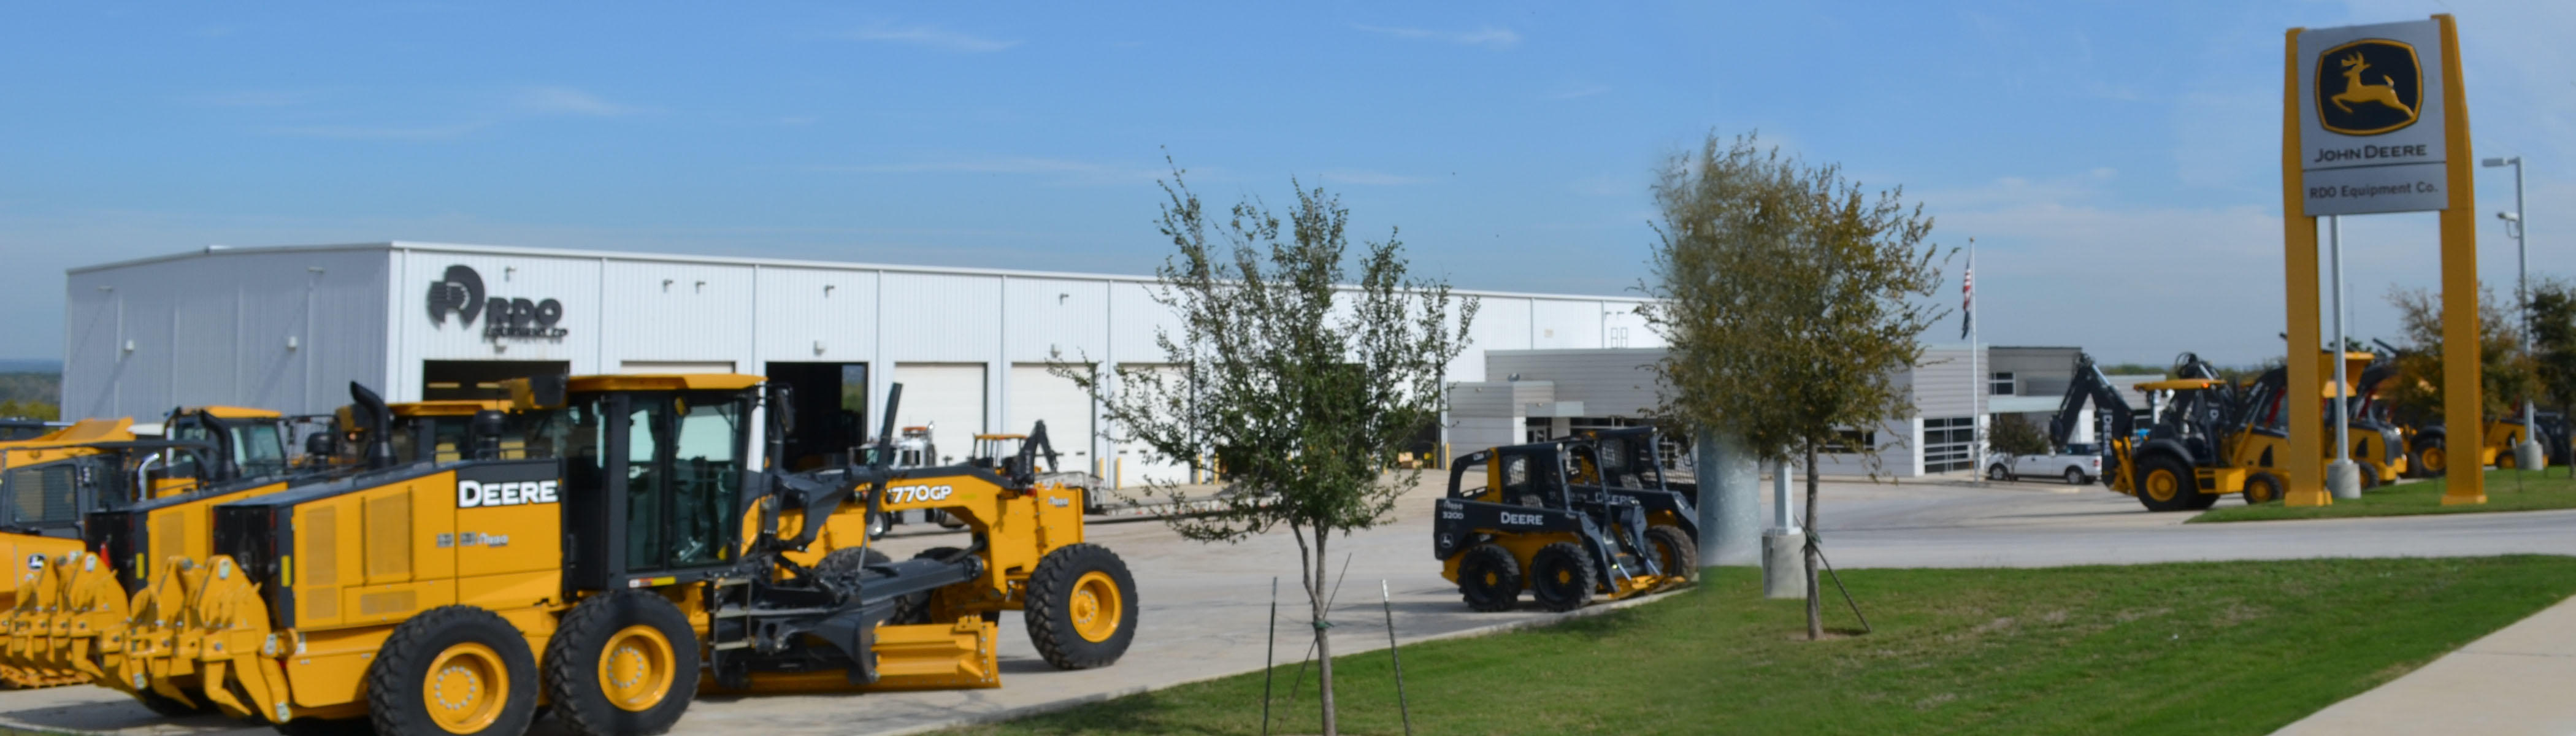 RDO Equipment Co. image 0